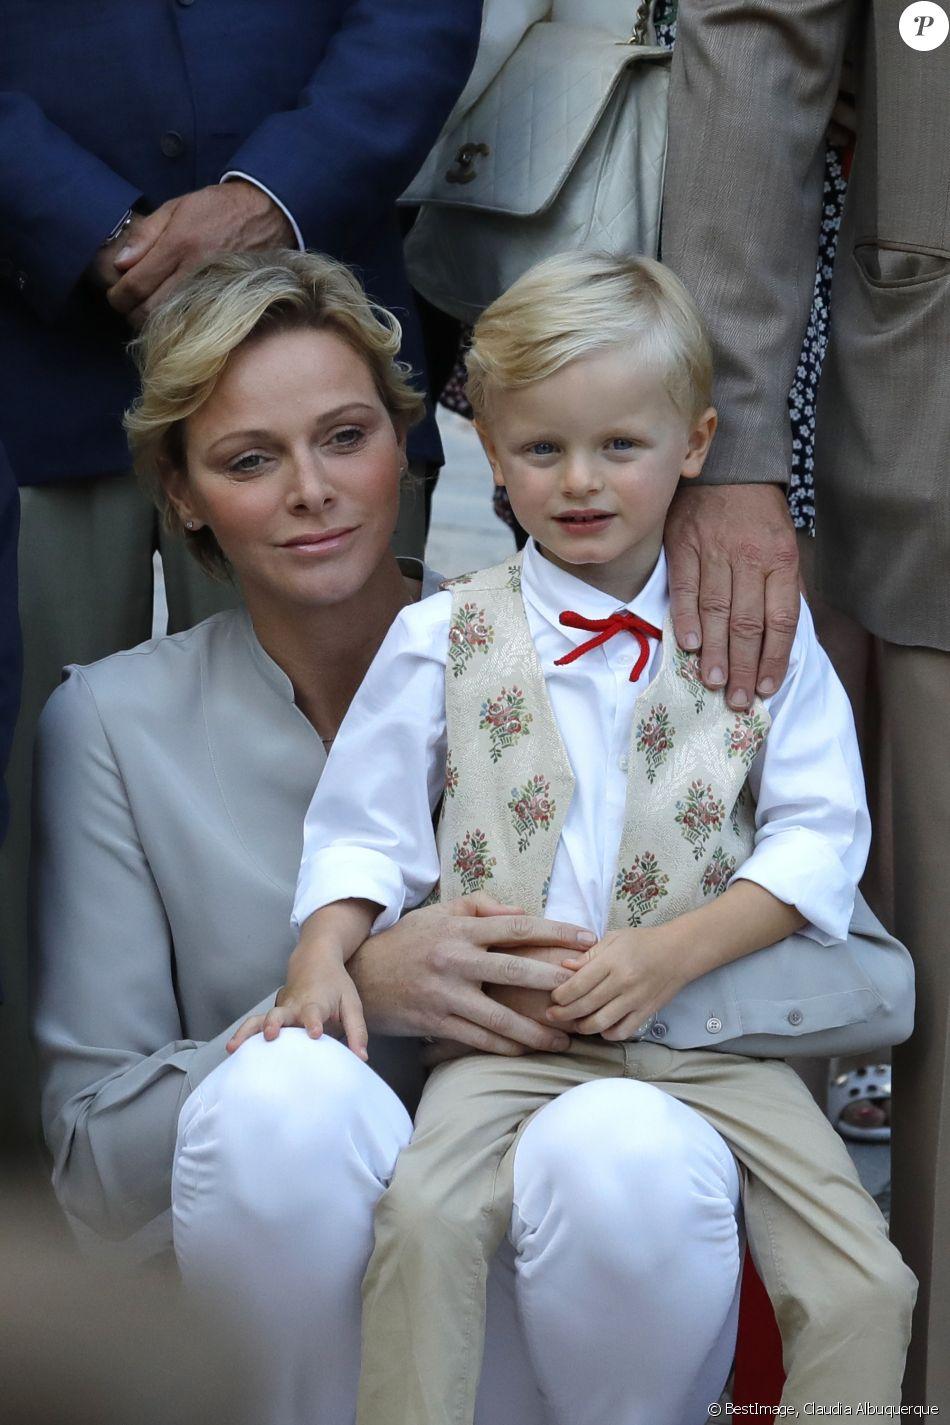 Alberto II y Charlene, Príncipes de Mónaco - Página 11 4280078-la-princesse-charlene-de-monaco-avec-le-950x0-2